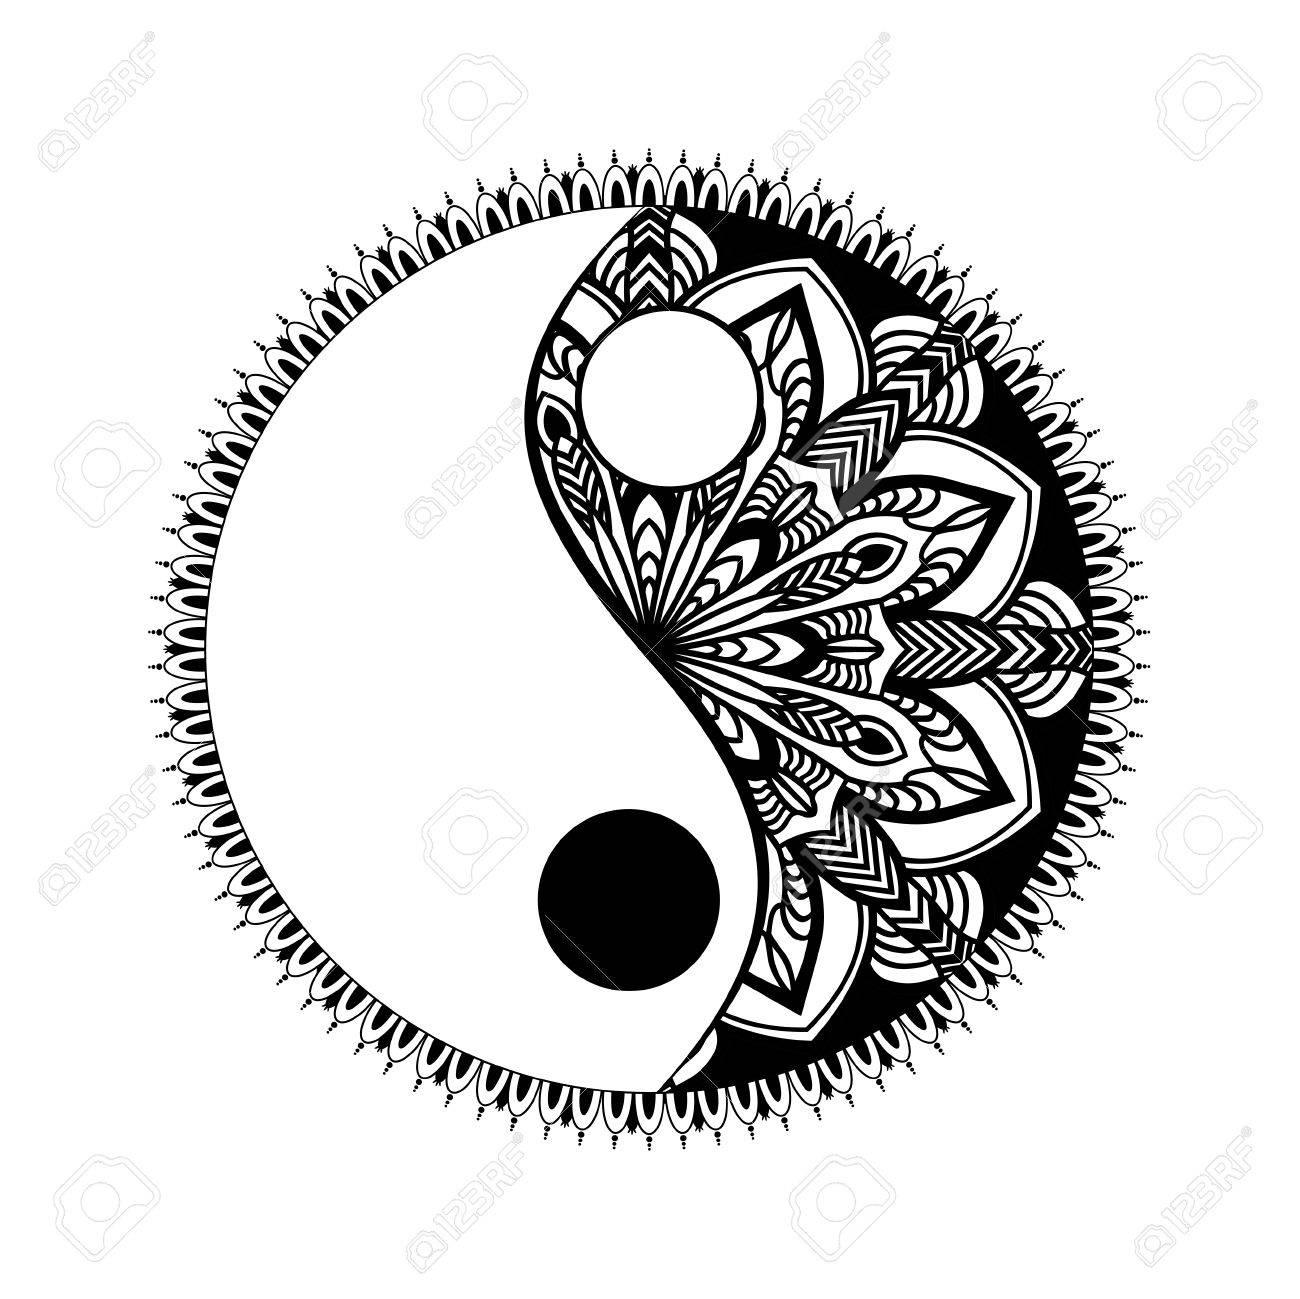 Monocromo Yin Yang Símbolo Decorativo Dibujado A Mano Elemento De